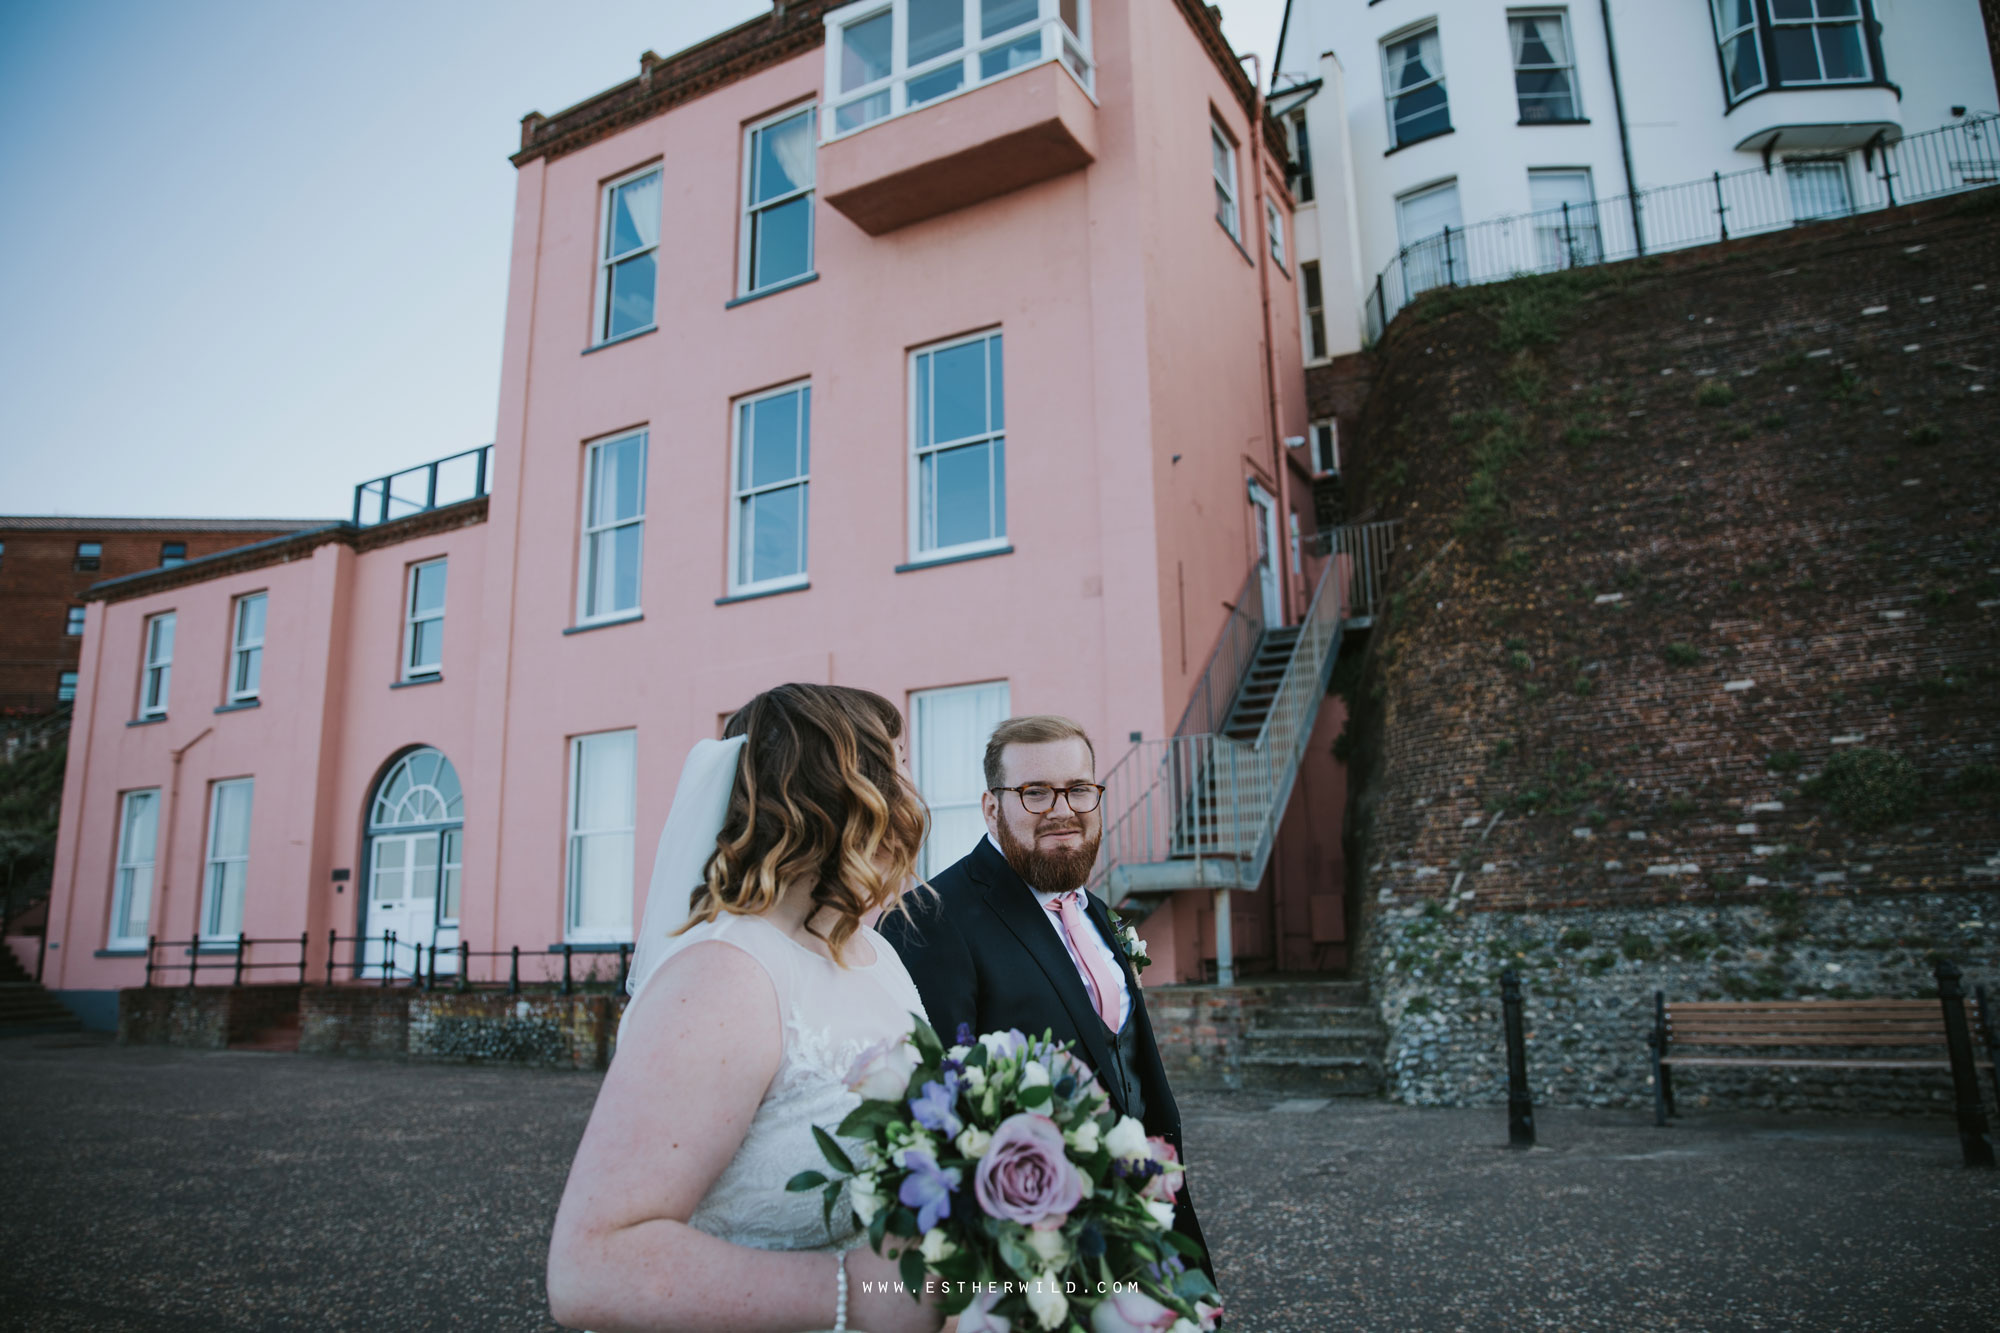 Cromer_Wedding_Beach_Outdoor_Ceremony_Norfolk_North_Lodge_Registry_Office_Rocket_House_Cafe_Cromer_Pier_IMG_4578.jpg